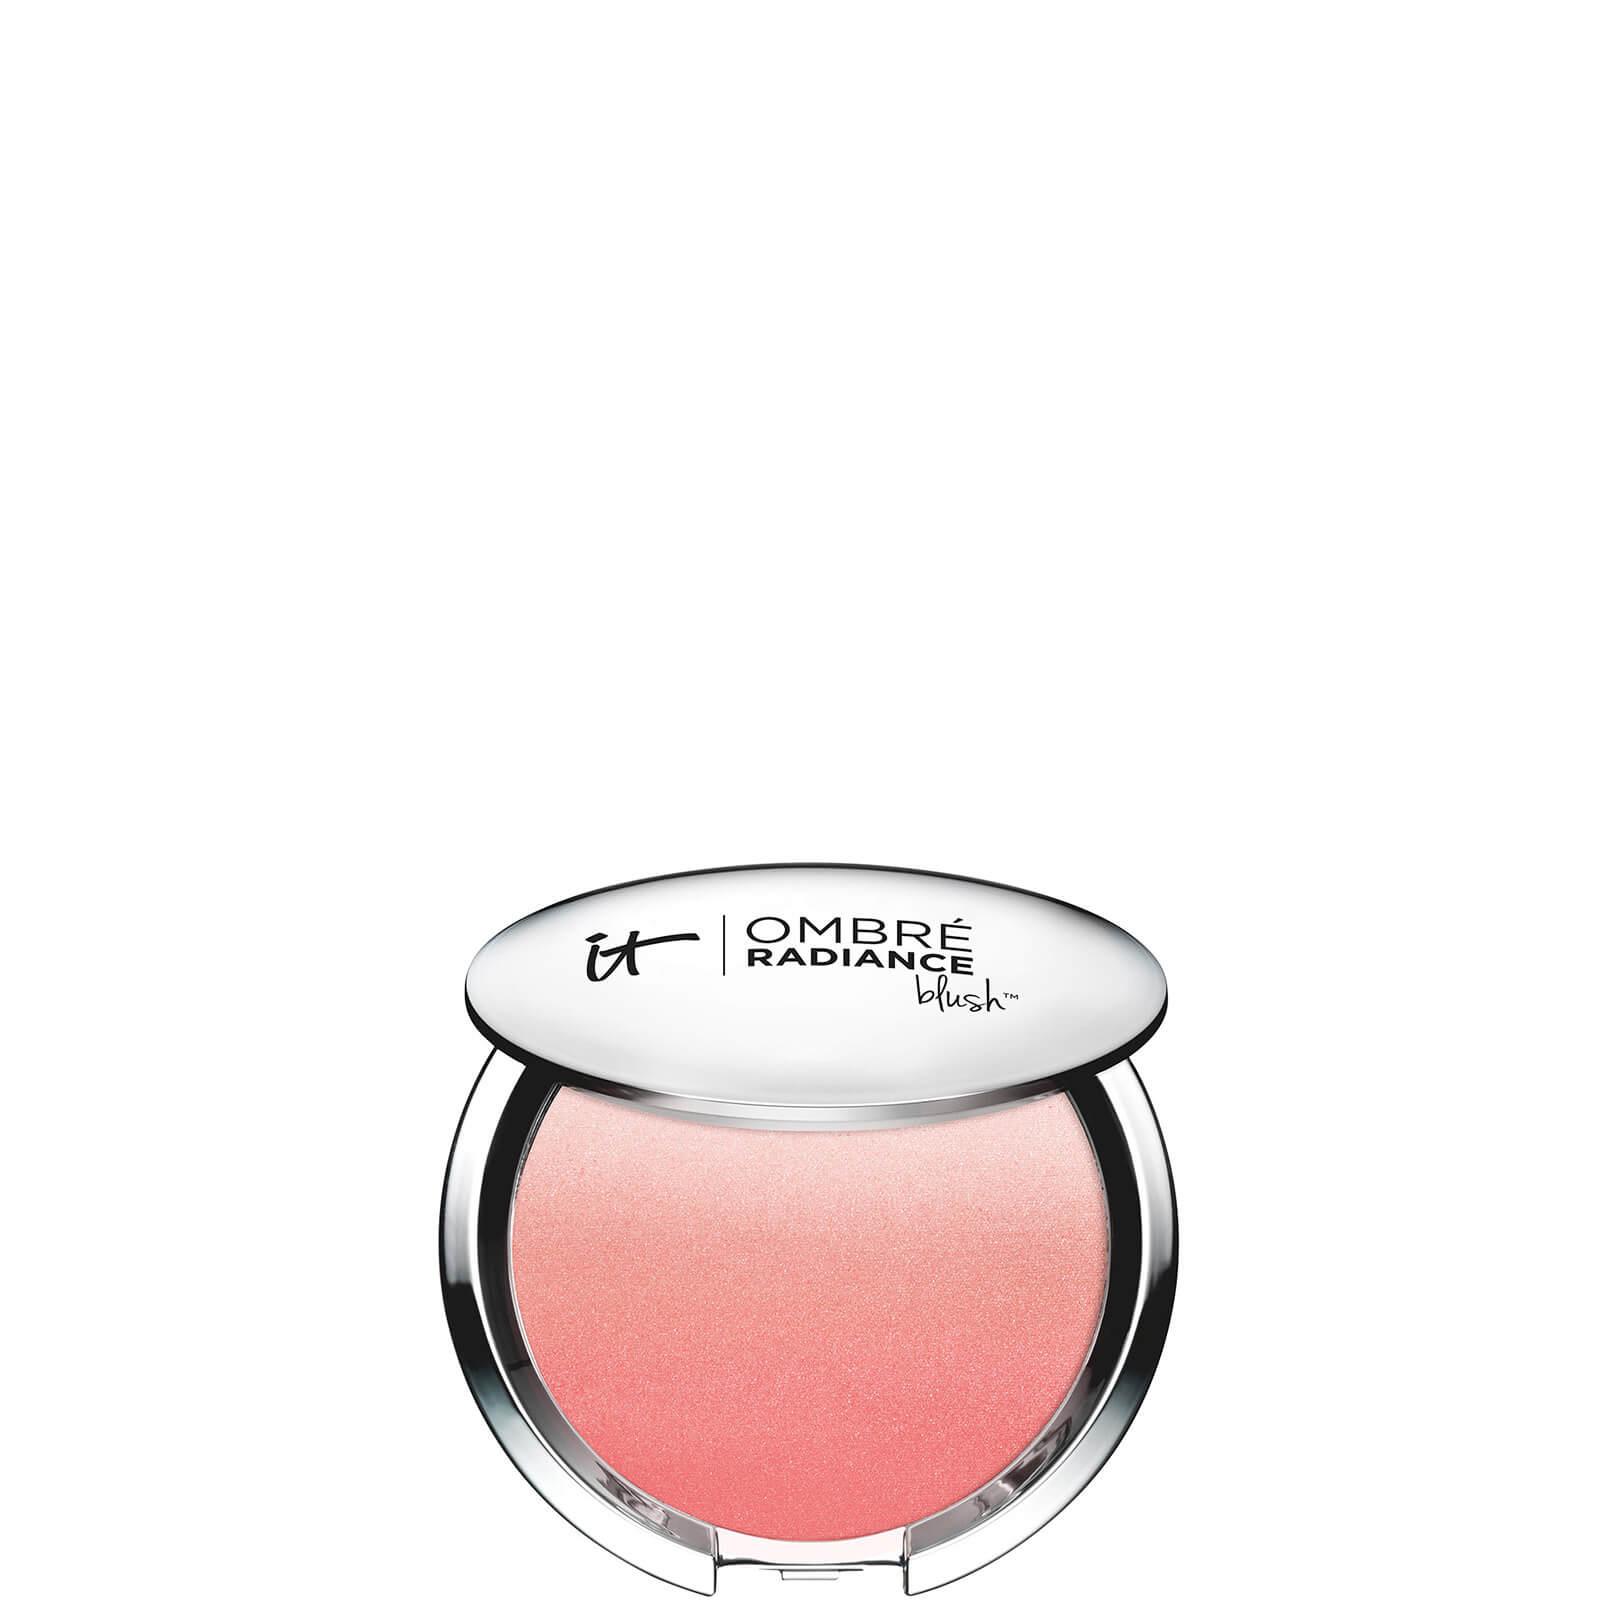 Купить IT Cosmetics Ombré Radiance Blush 10.8g (Various Shades) - Coral Flush